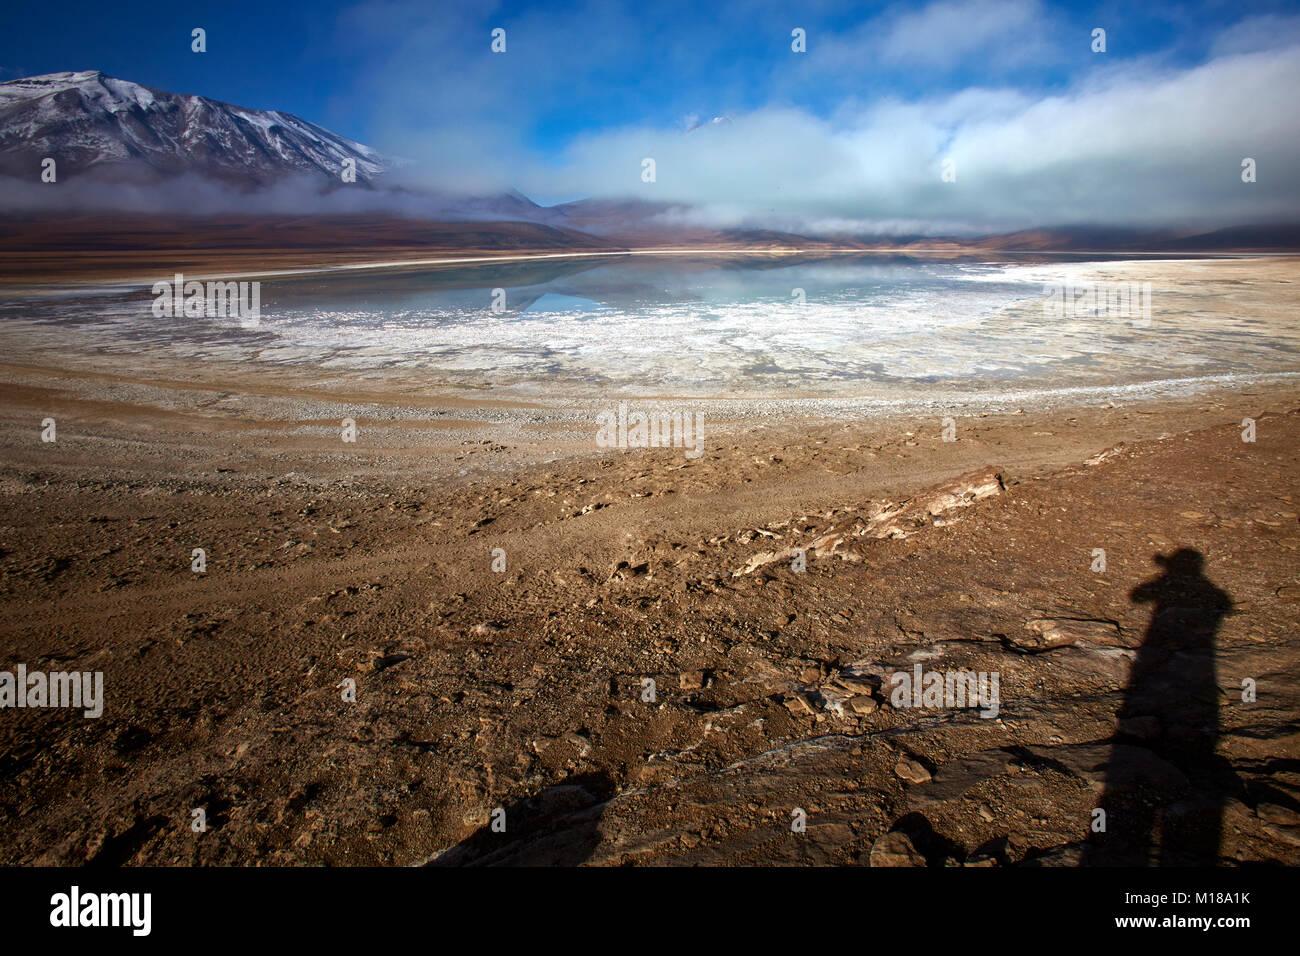 12 hours around the Salar de Uyuni - Stock Image